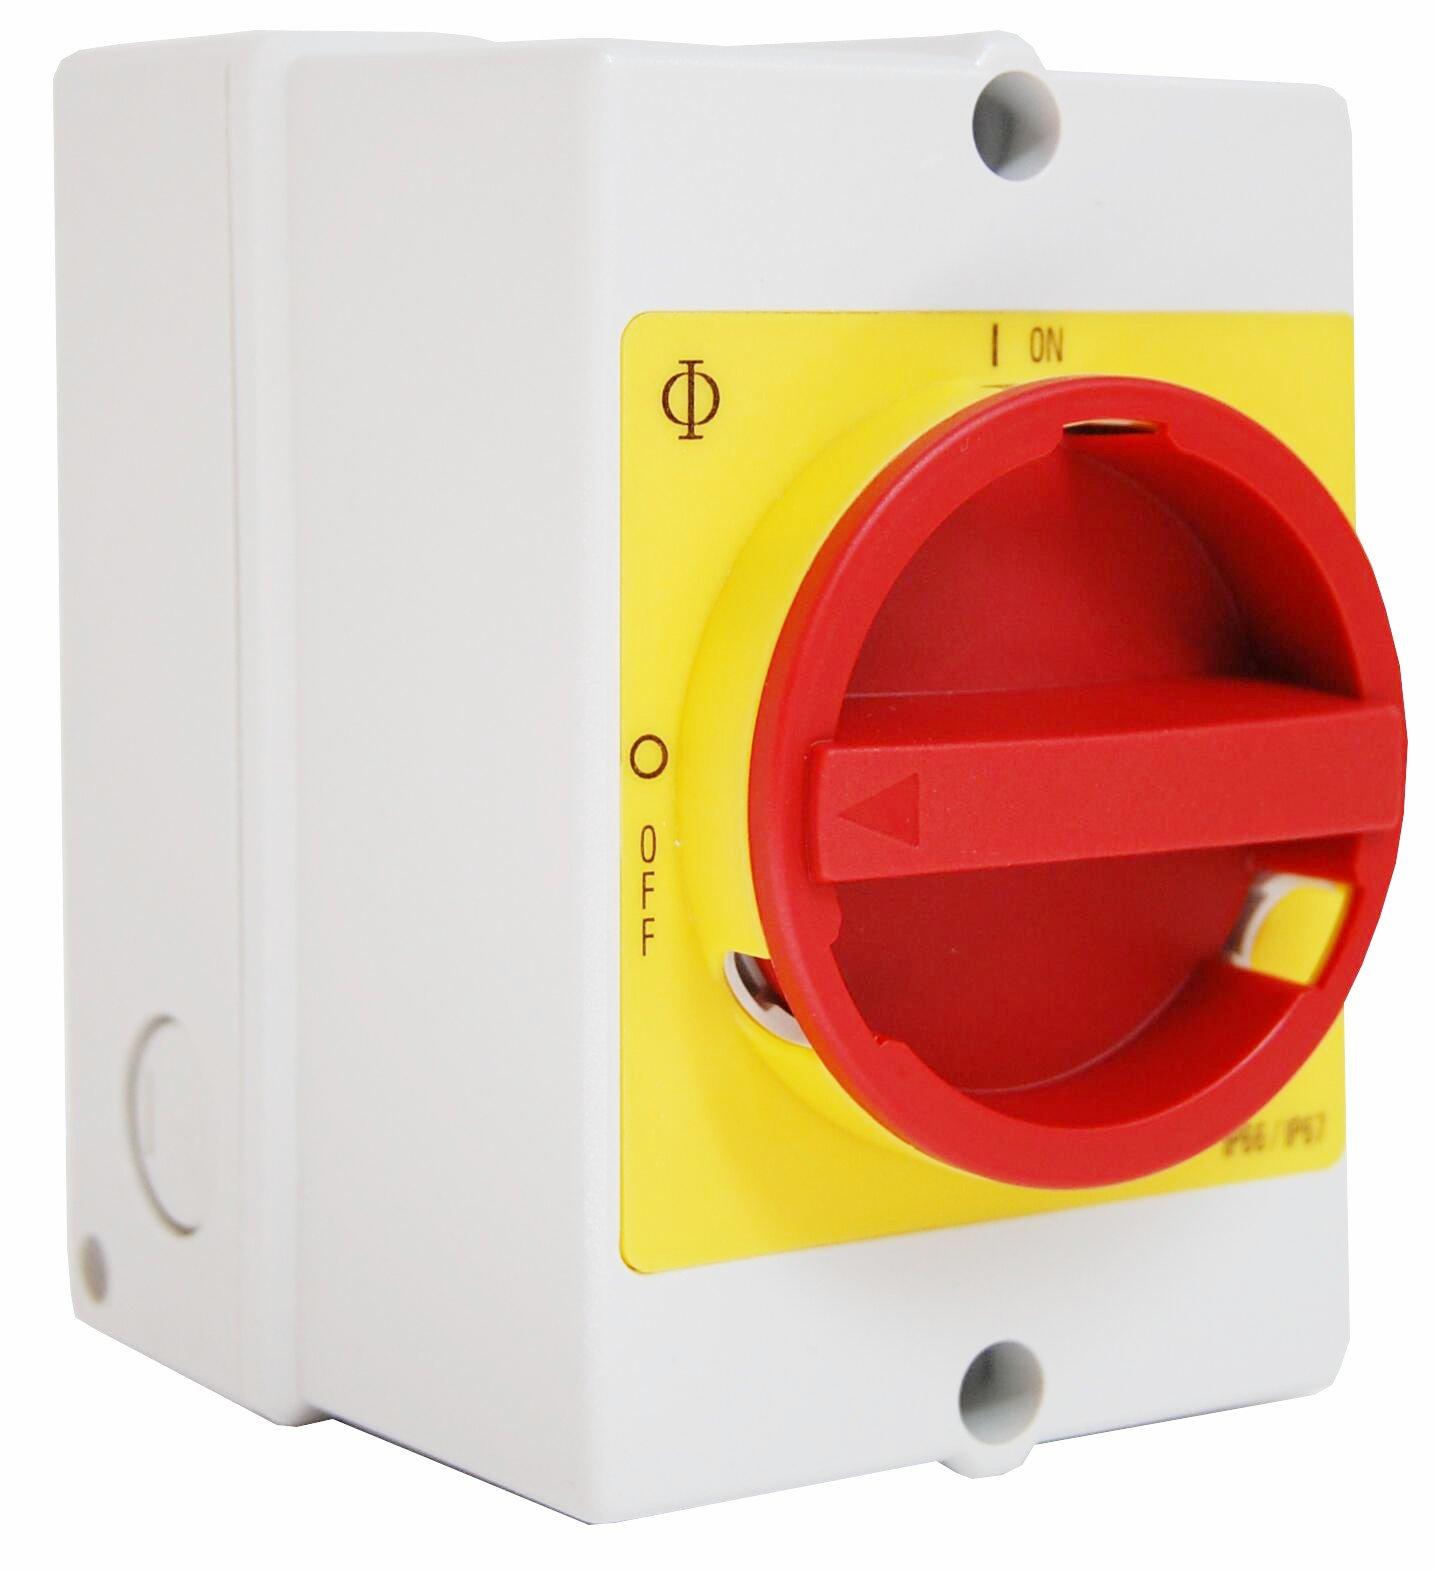 1 Stk Not-Aus-Schalter, 6-polig + 2 Hilfskontakte, PE-Klemme, 20A IN892015--